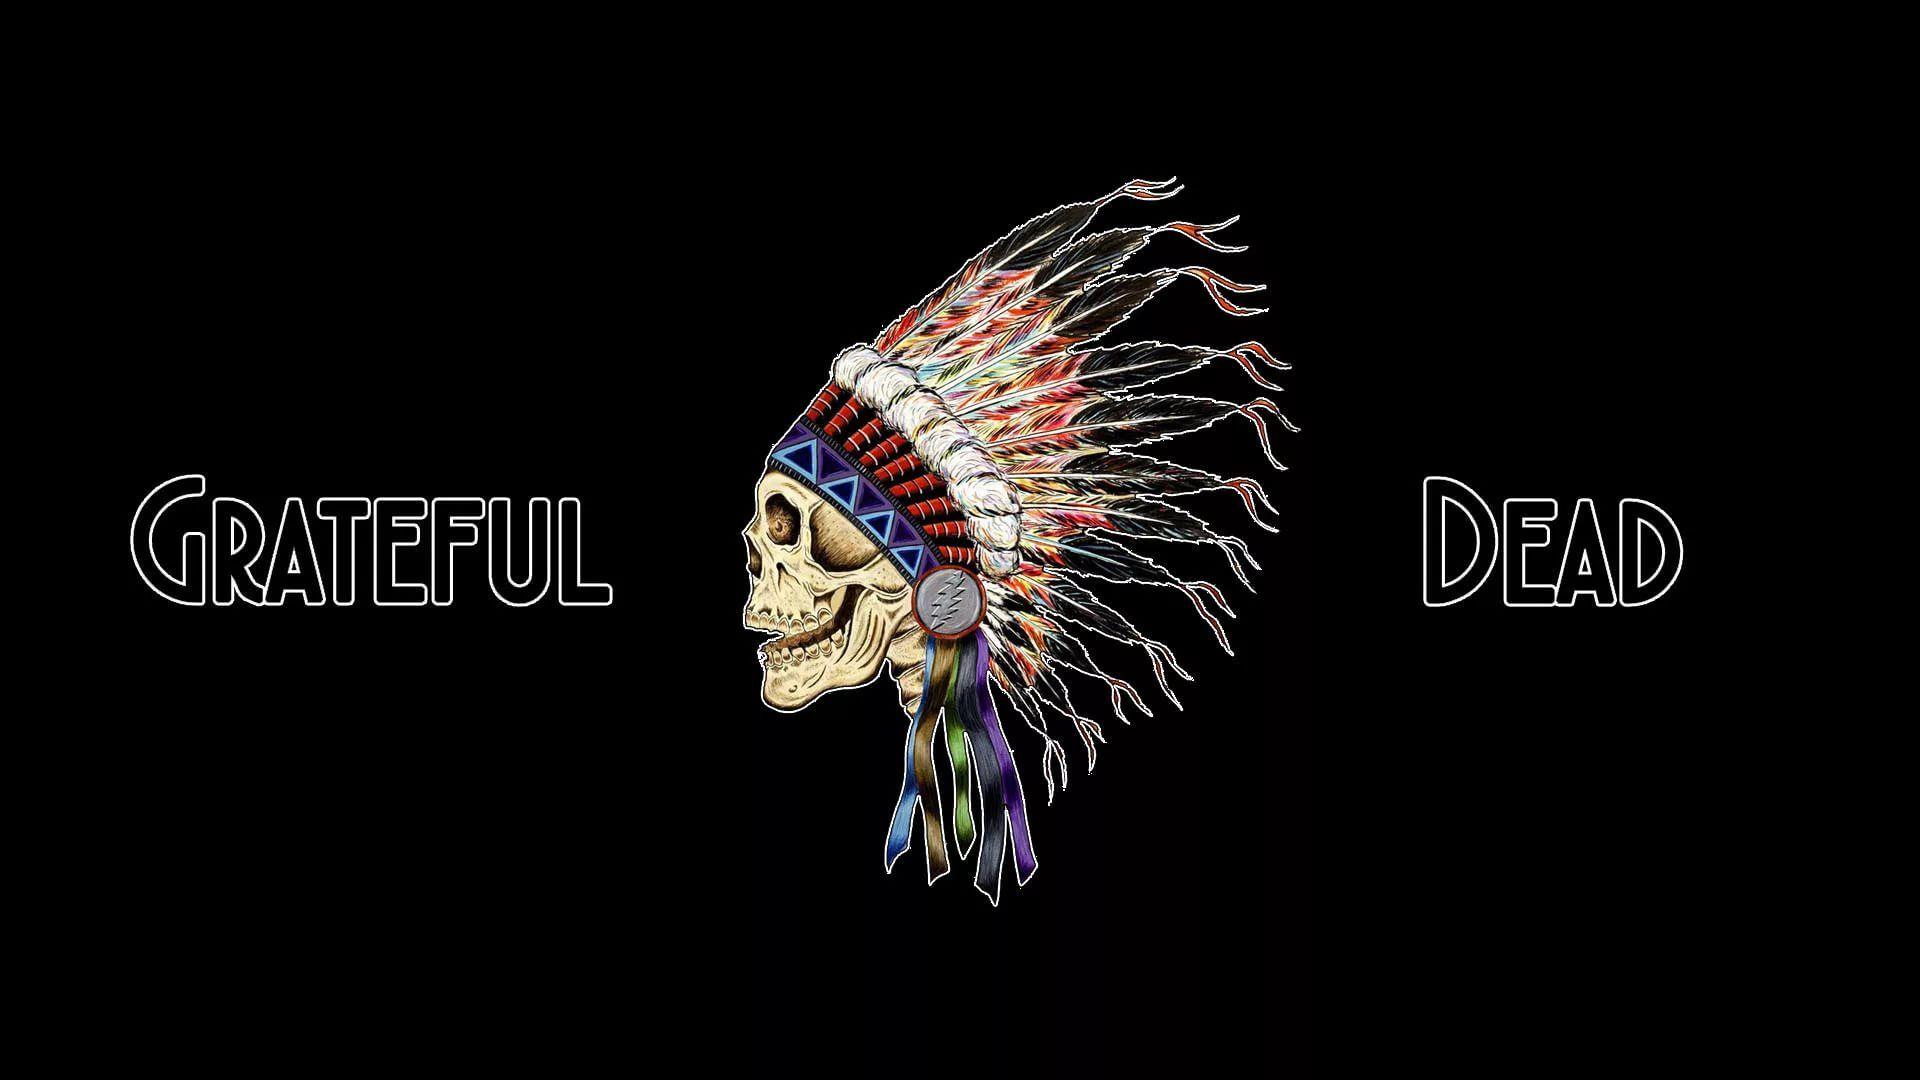 Grateful Dead screen wallpaper